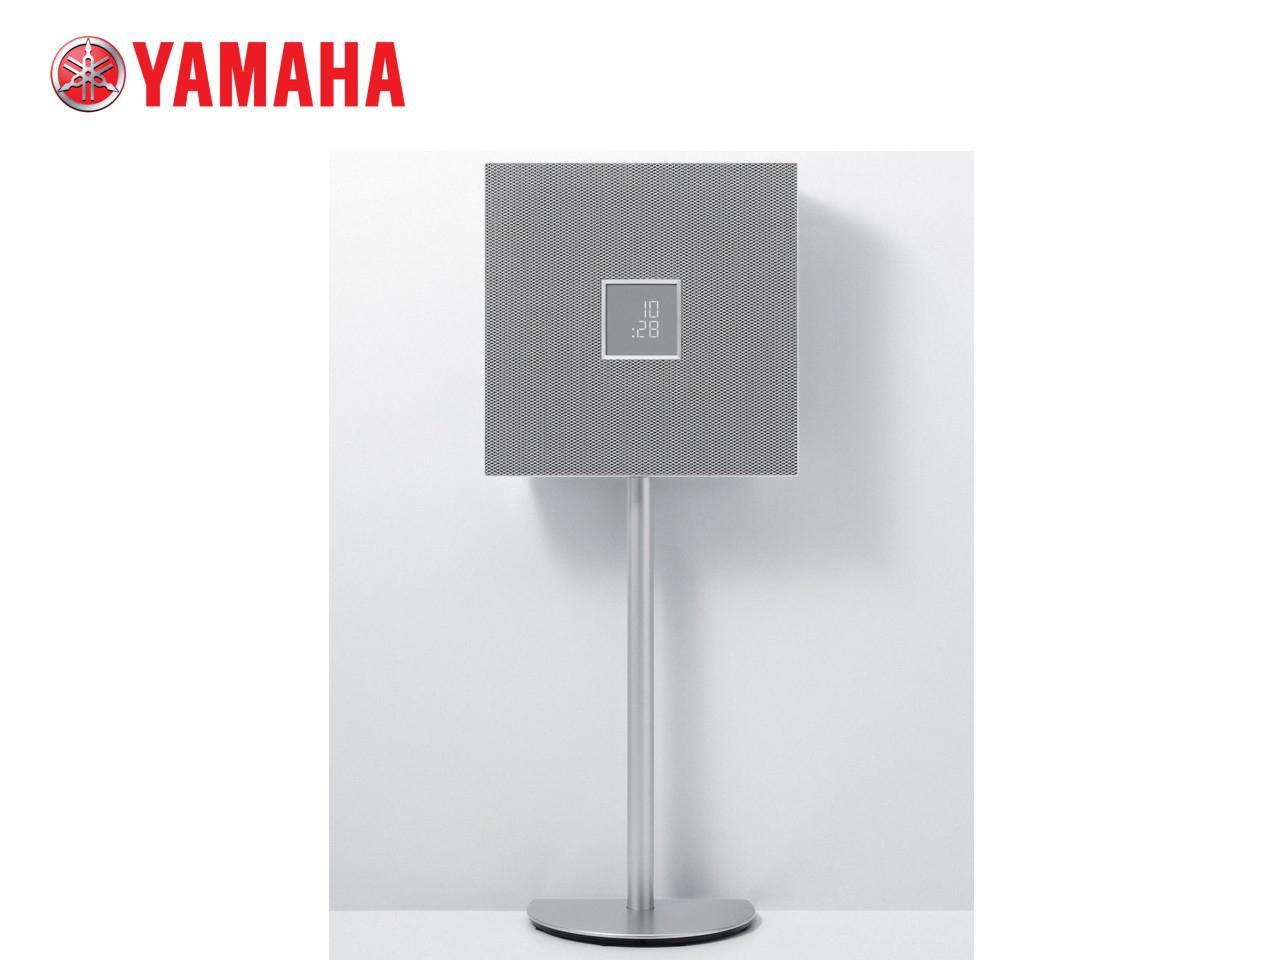 YAMAHA ISX-803D W